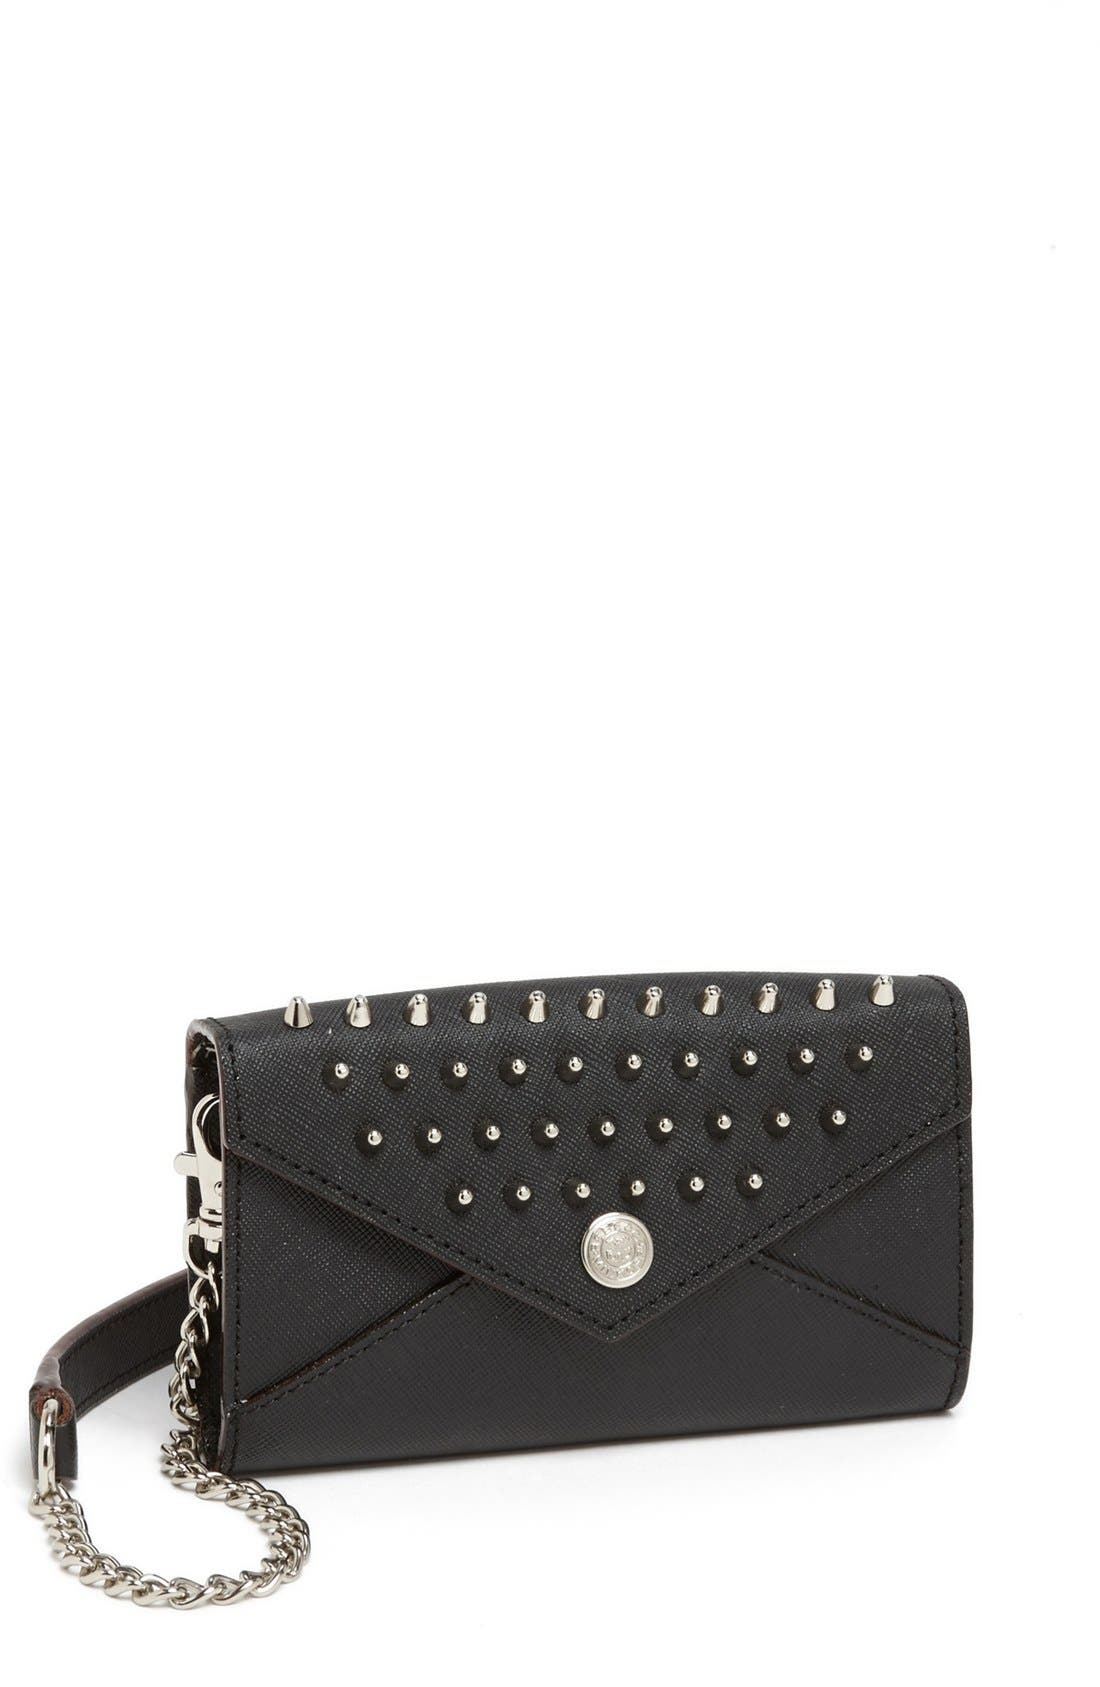 Main Image - Rebecca Minkoff 'Studded Wallet on a Chain - Mini' Crossbody Bag